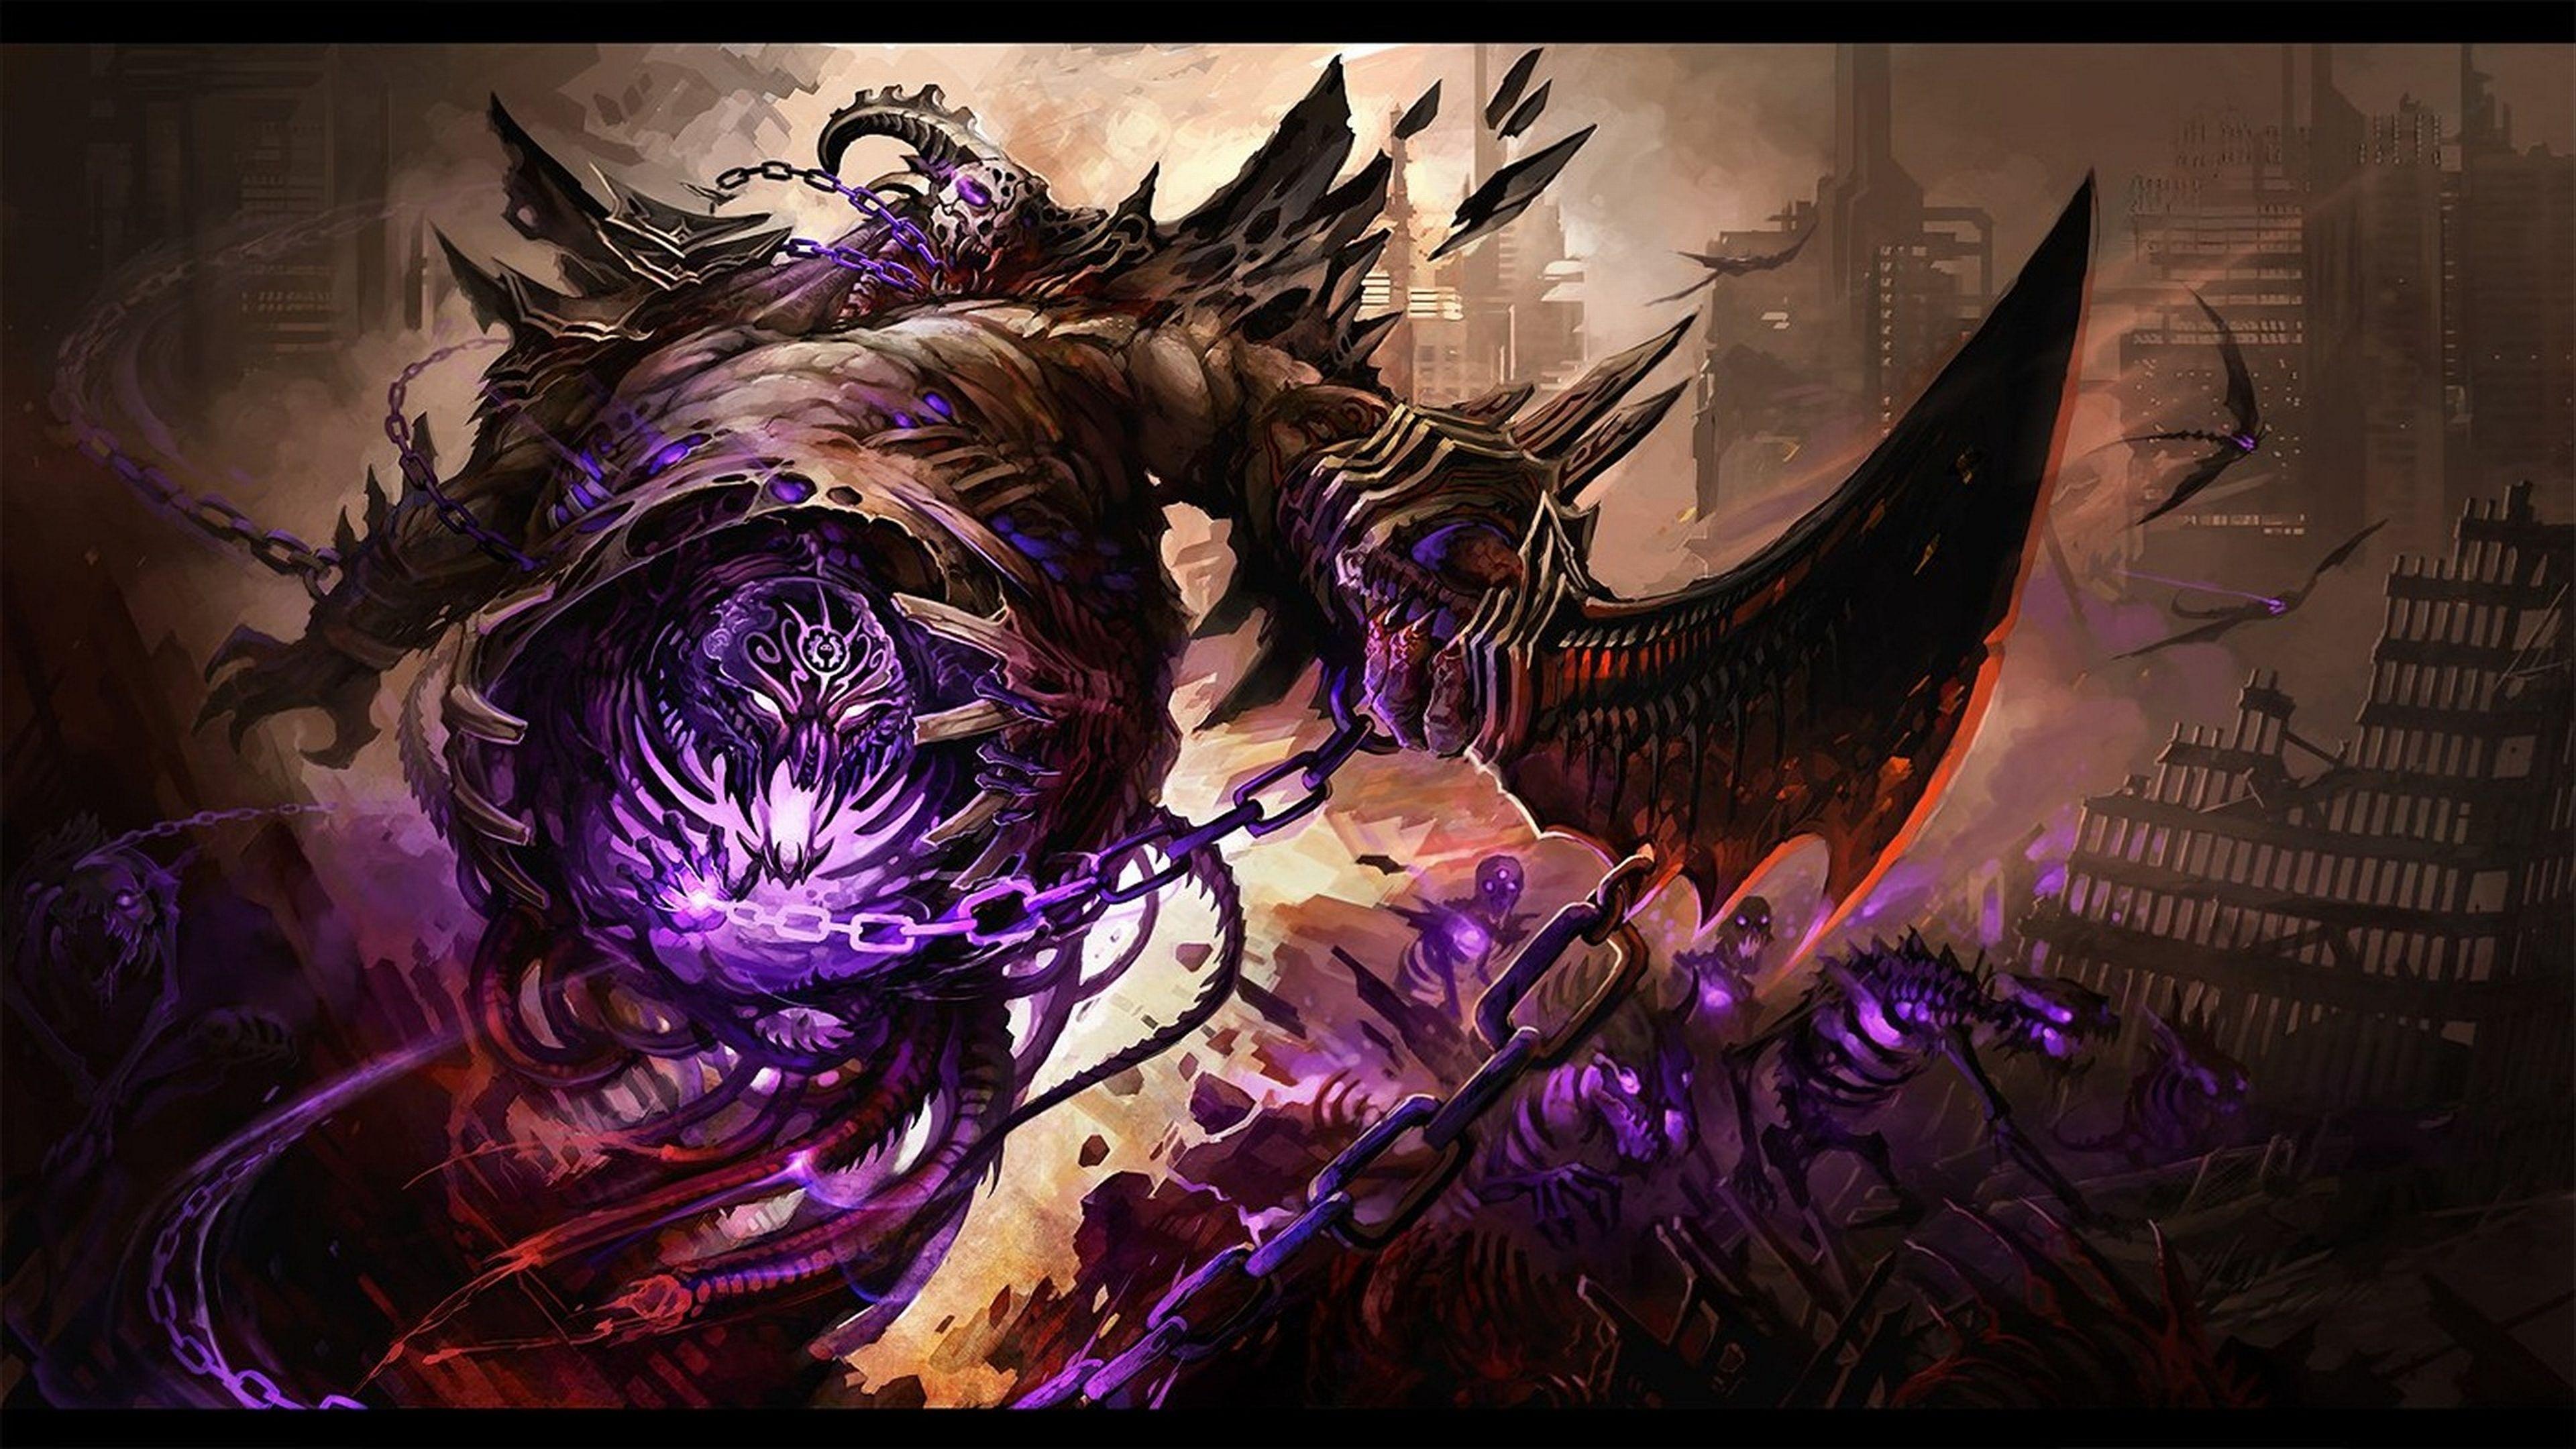 Demon Computer Wallpapers Desktop Backgrounds 3840x2160 Id 157336 Dark Fantasy Art Fantasy Illustration Cool Artwork